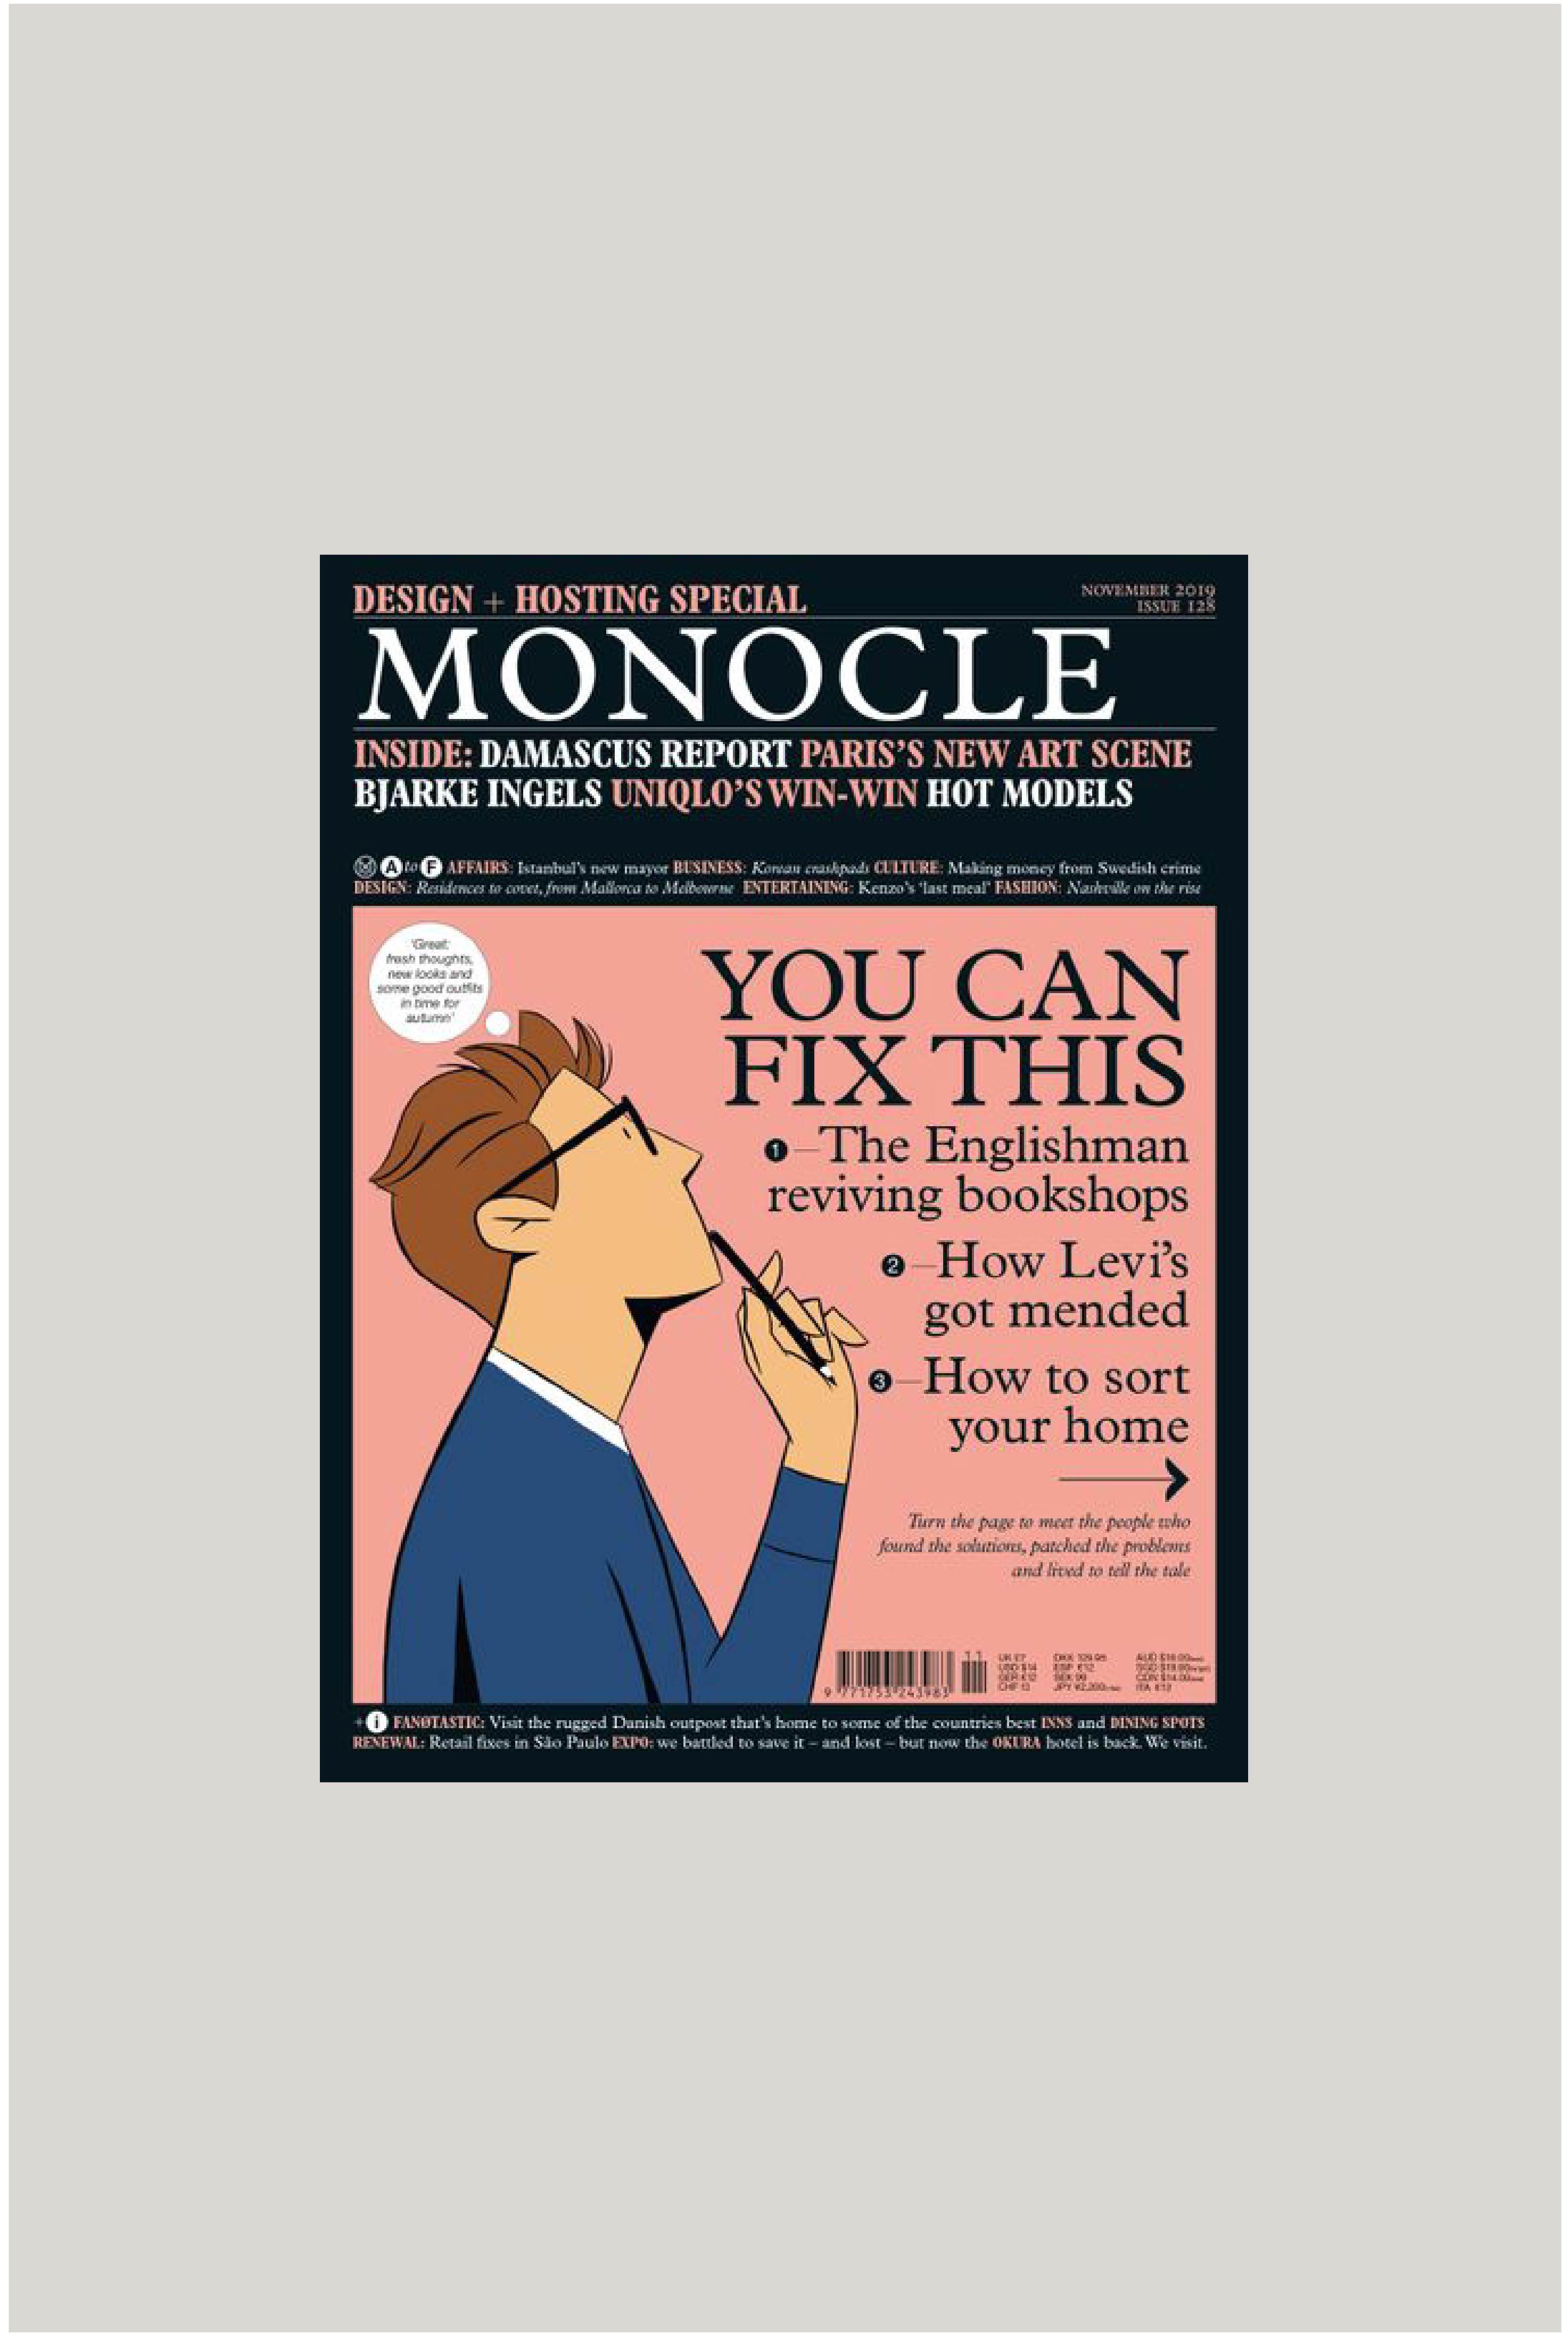 Monocle Nov 2019